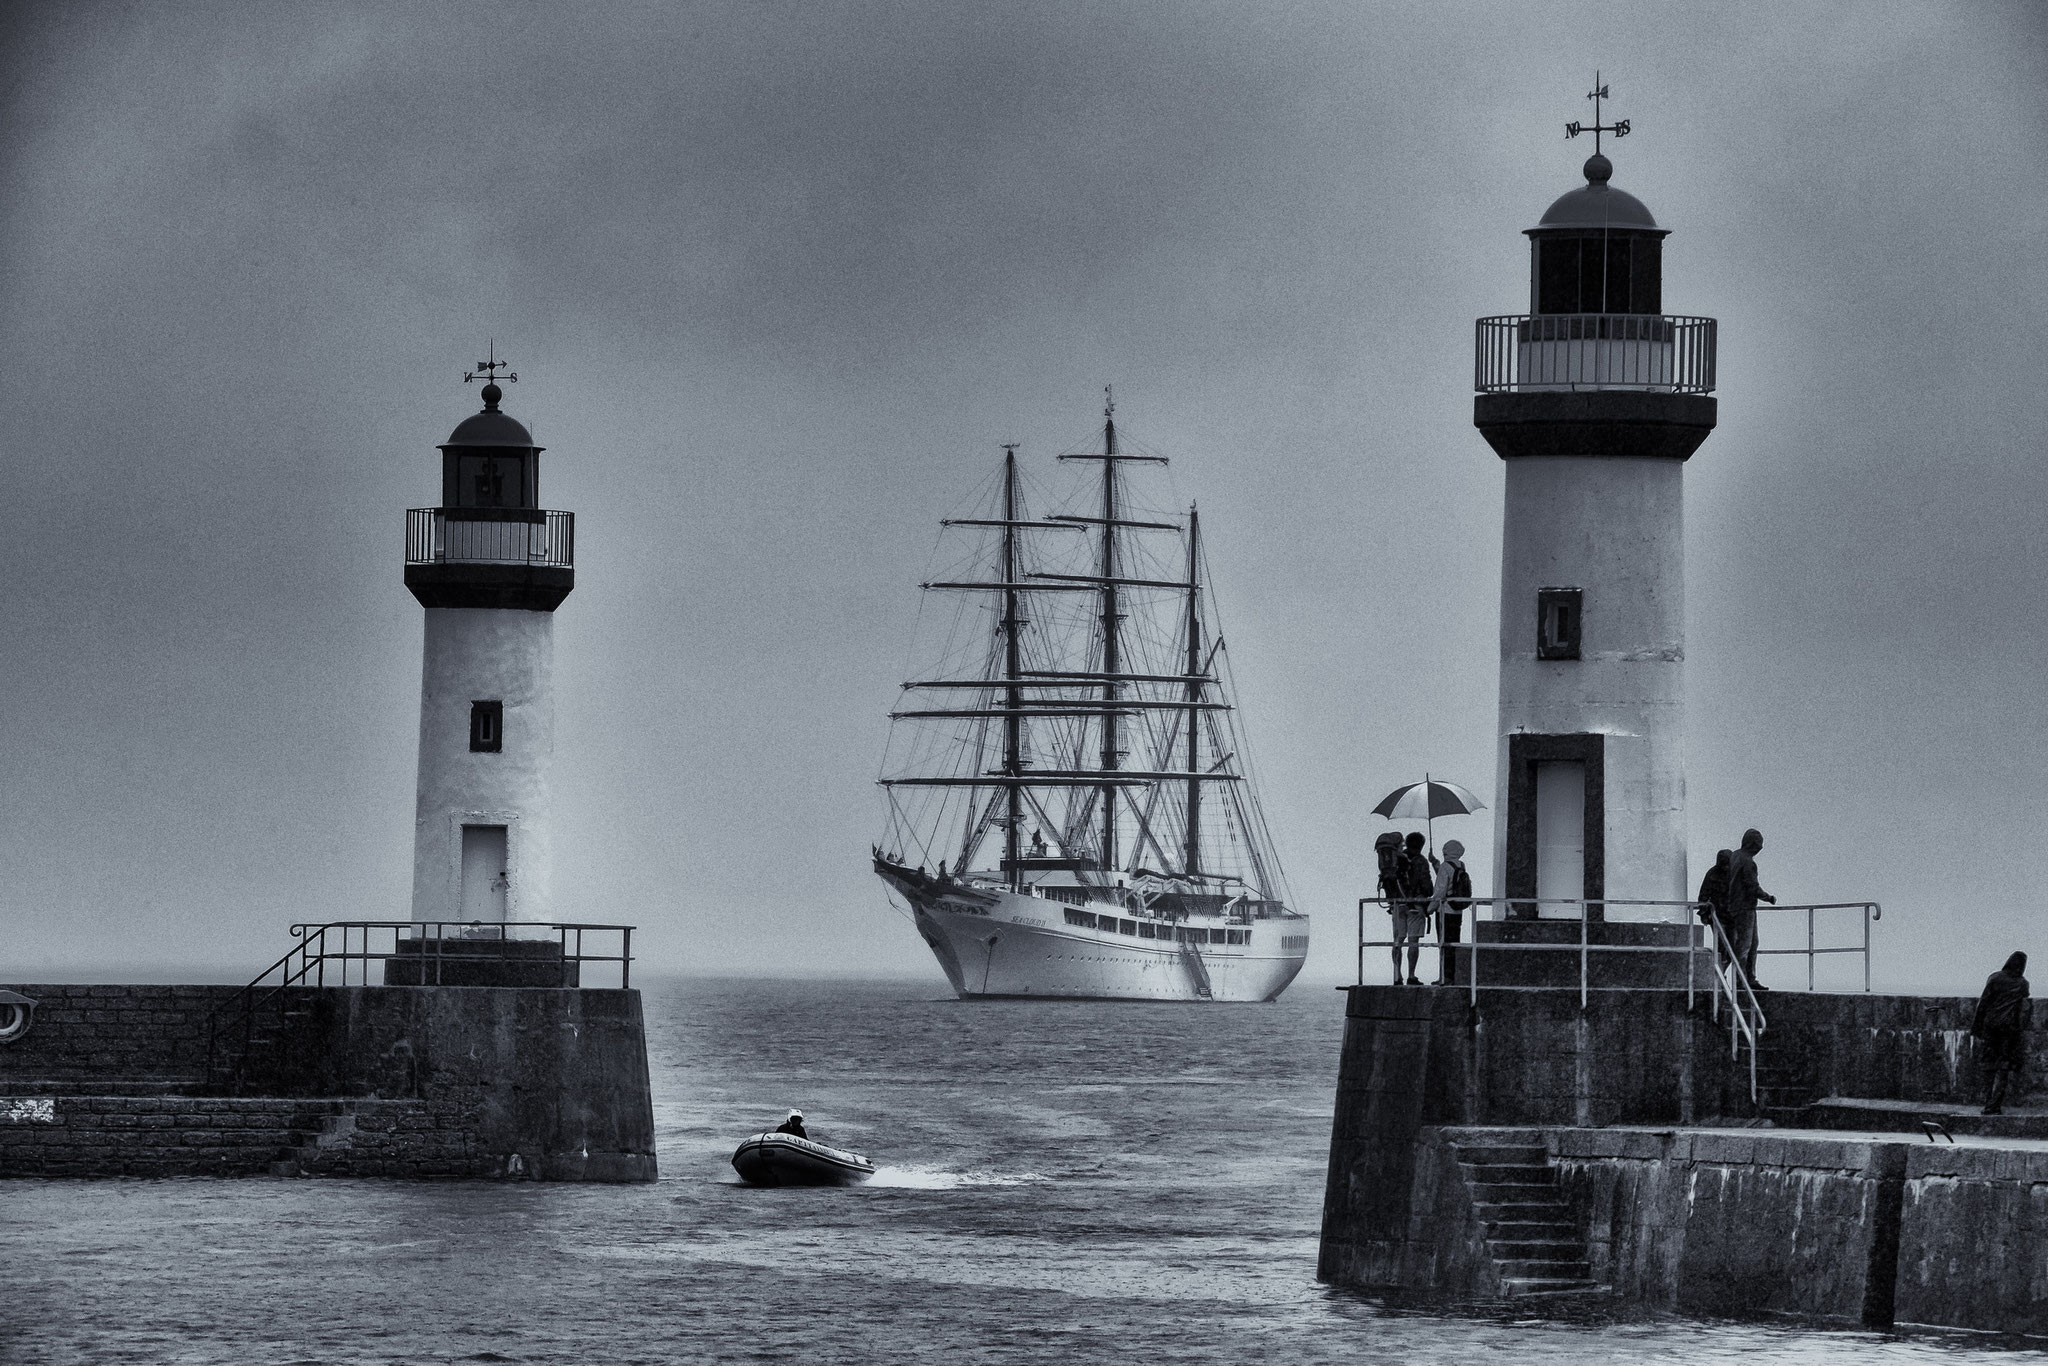 © Hans G. Lehmann | Hafeneinfahrt  Le Palais / Belle-Ile-en Mer mit Großsegler Sea Cloud II, Frankreich